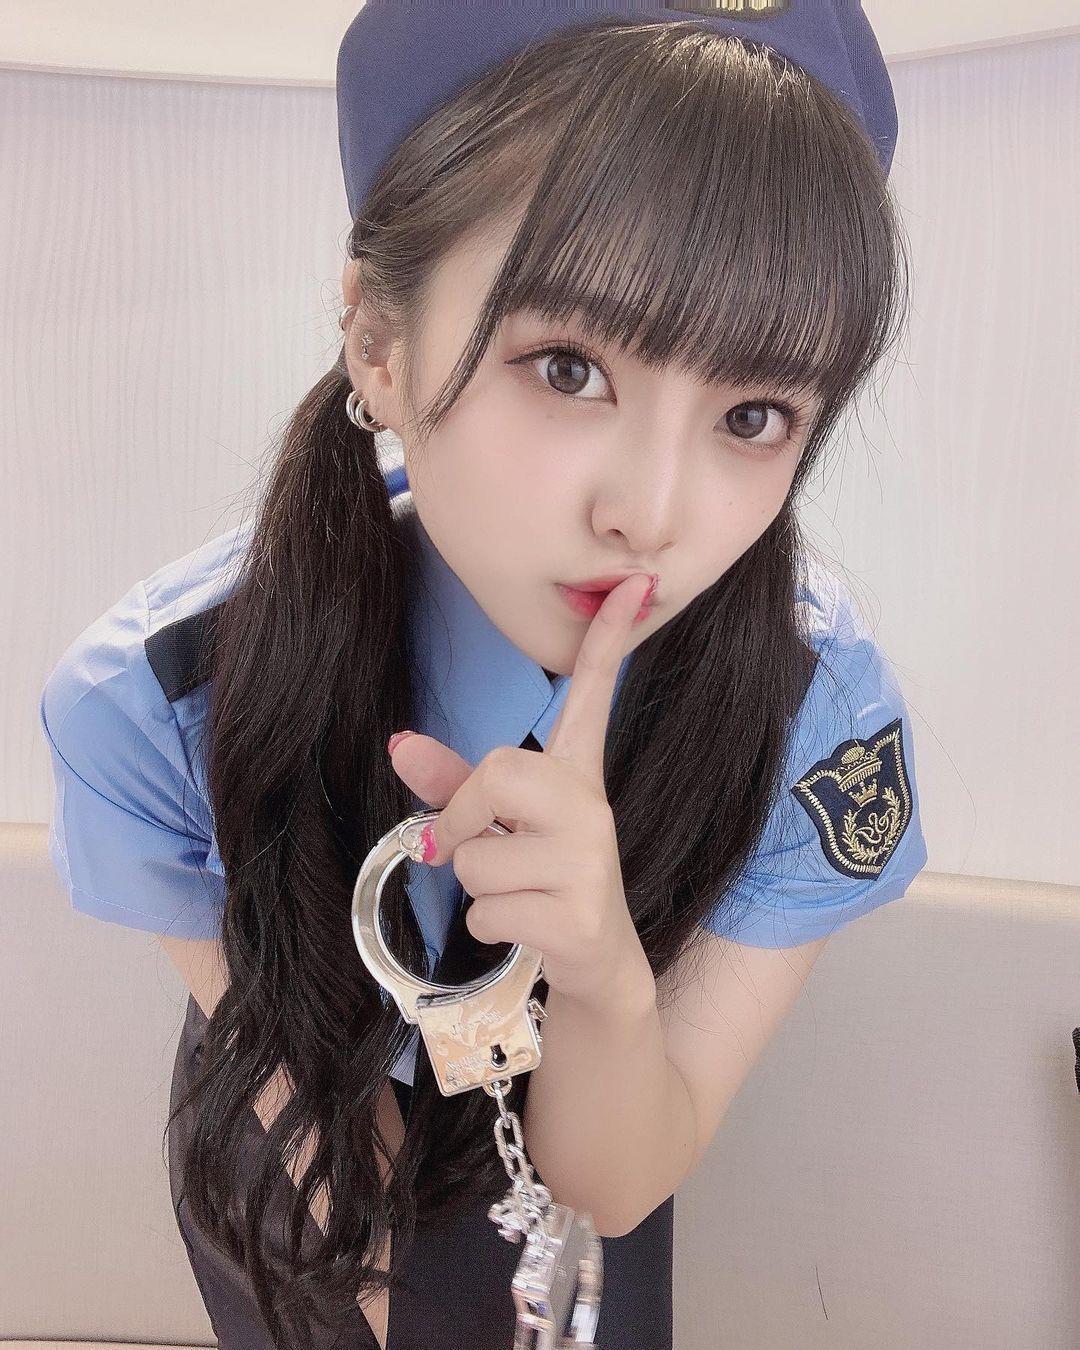 大眼美女@神城ののか 咬发圈撩马尾模样超可爱 网络美女 第3张